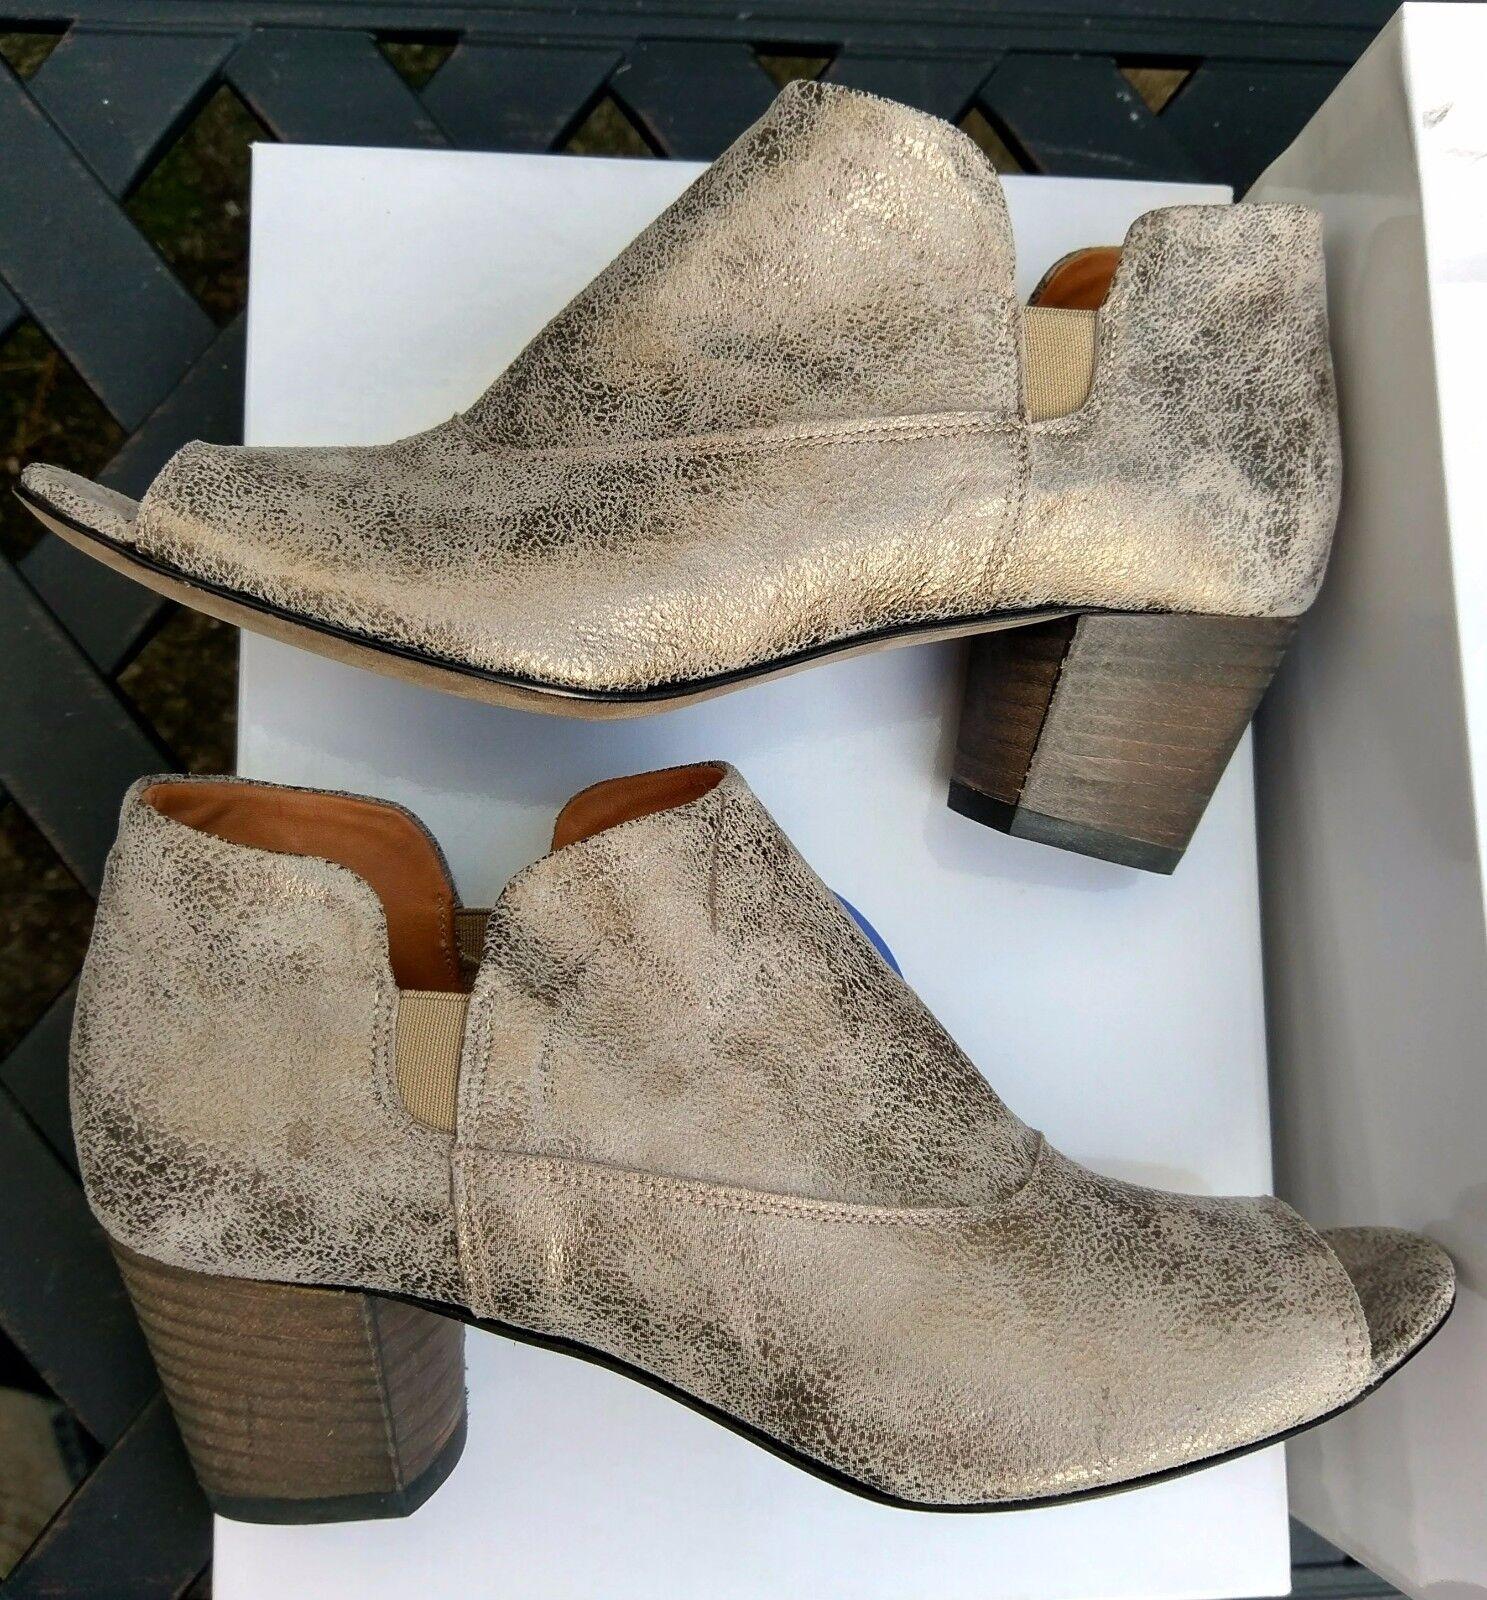 LUXURY DRACENA WOMEN'S Schuhe SIZE 36.5